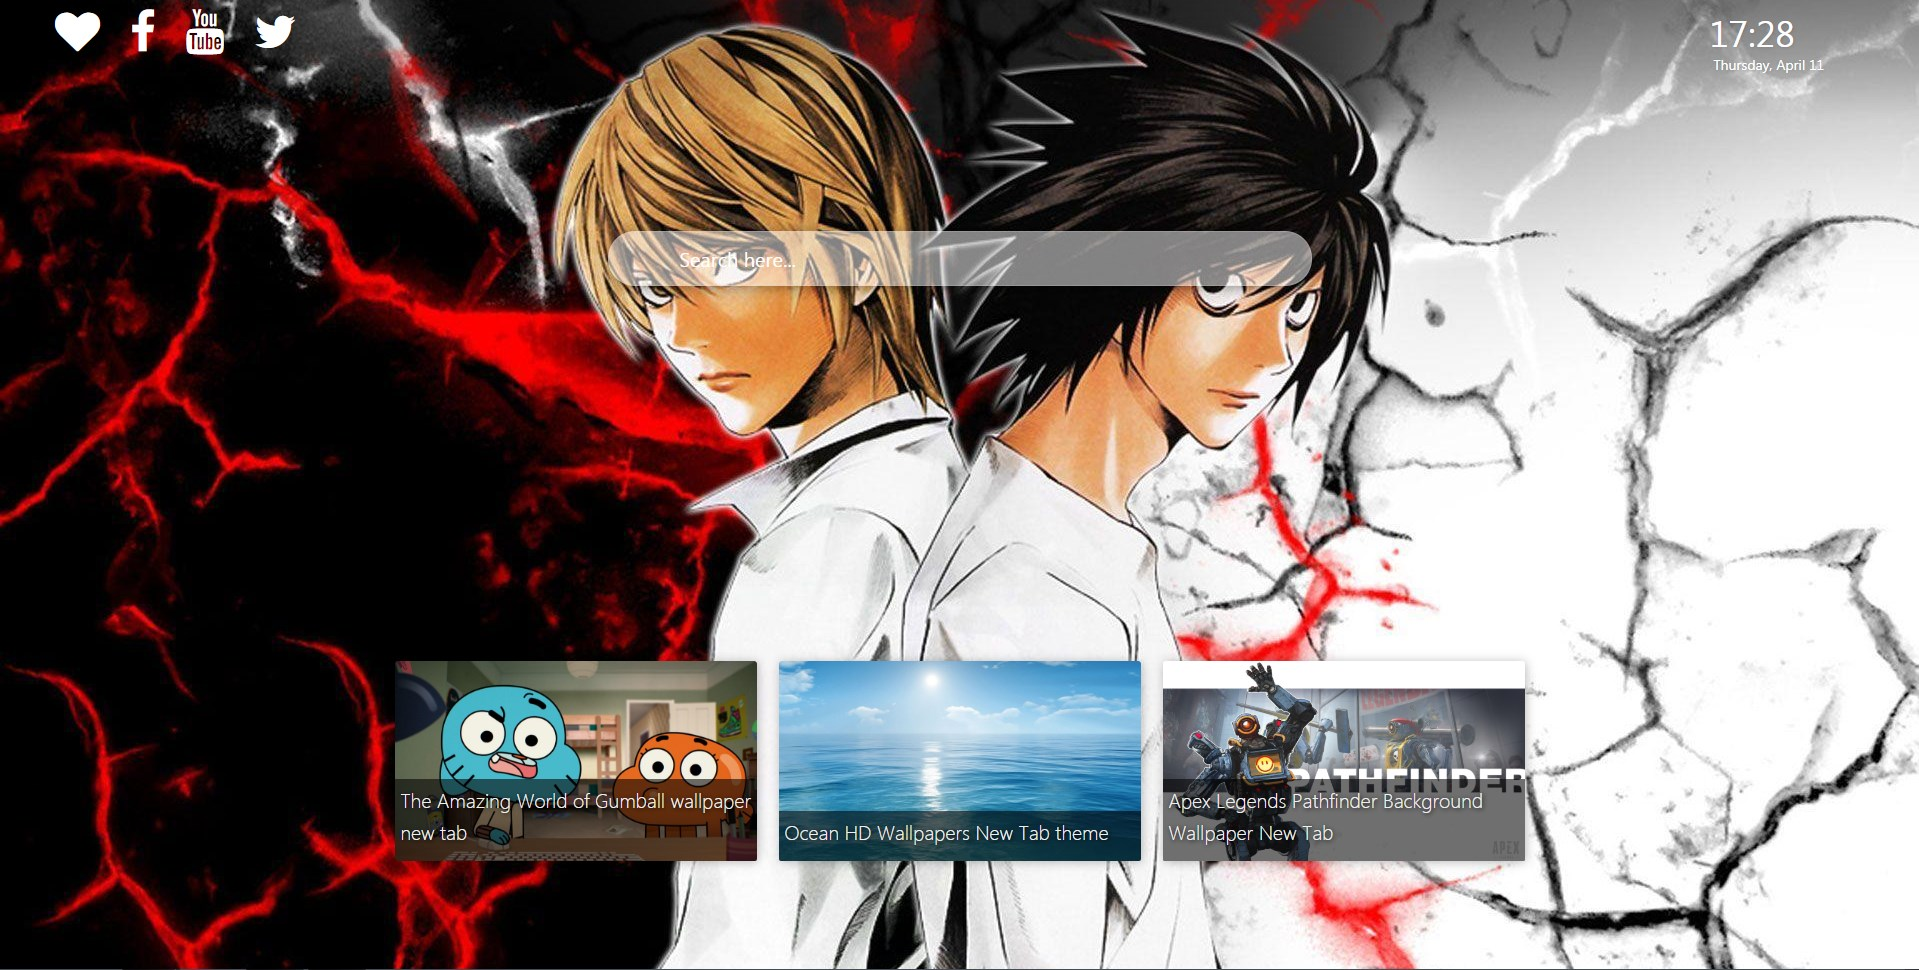 death note wallpaper,cartoon,anime,games,cg artwork,graphic design